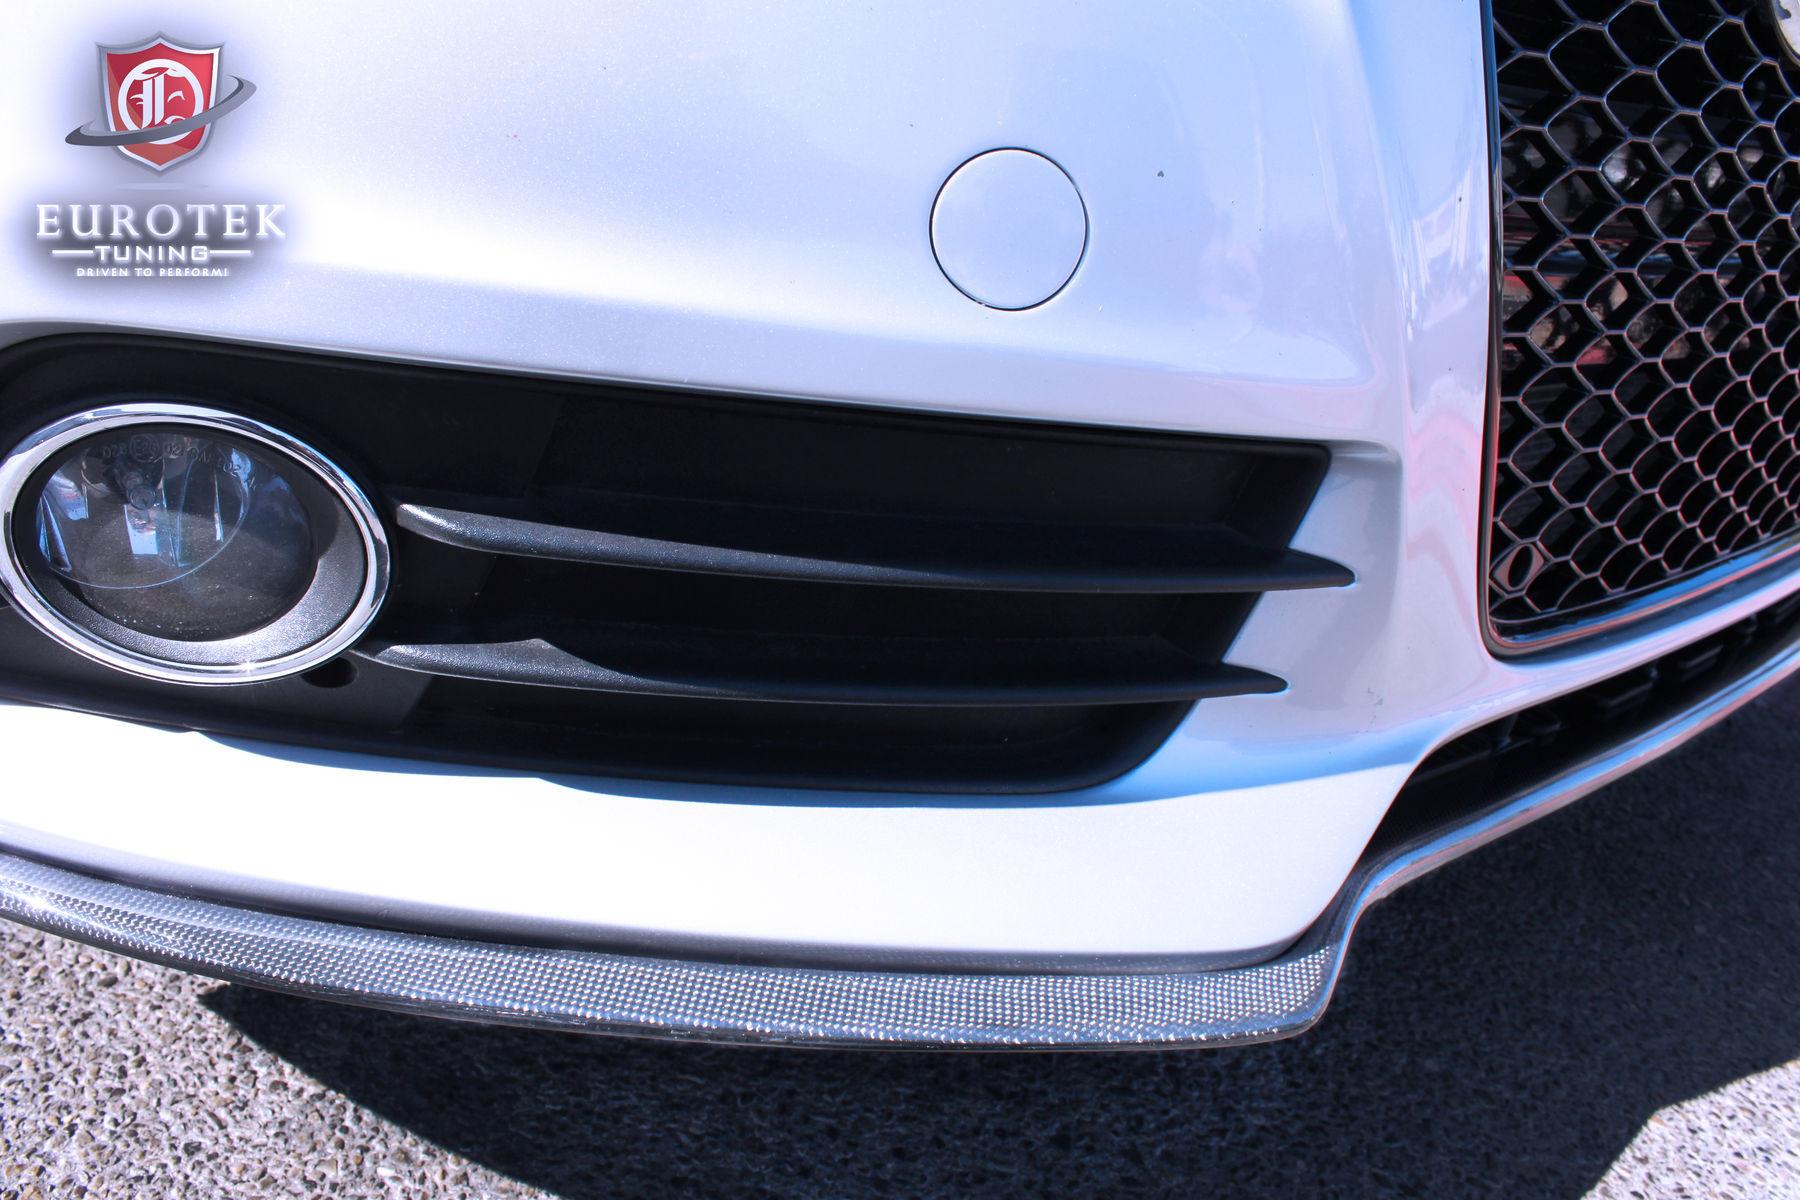 2011 Audi S4 | EuroGEAR Audi B8 A4 S line & S4 Carbon Fiber Splitter (front)